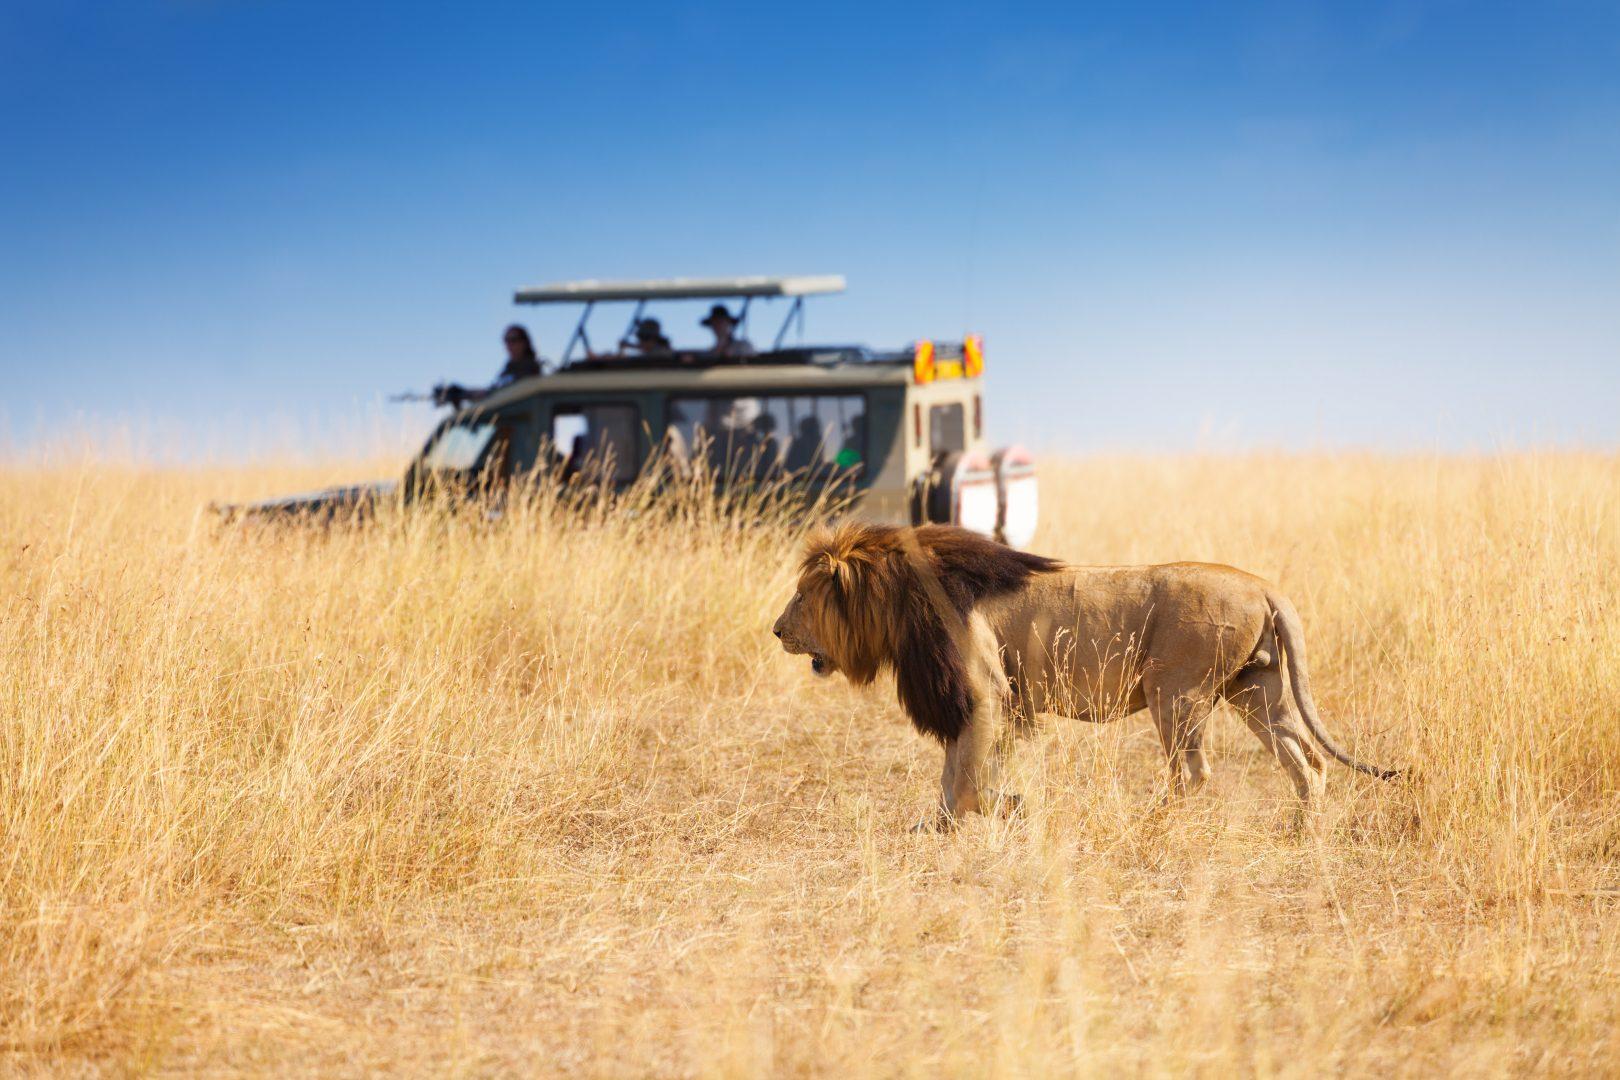 shutterstock_520053802_safari